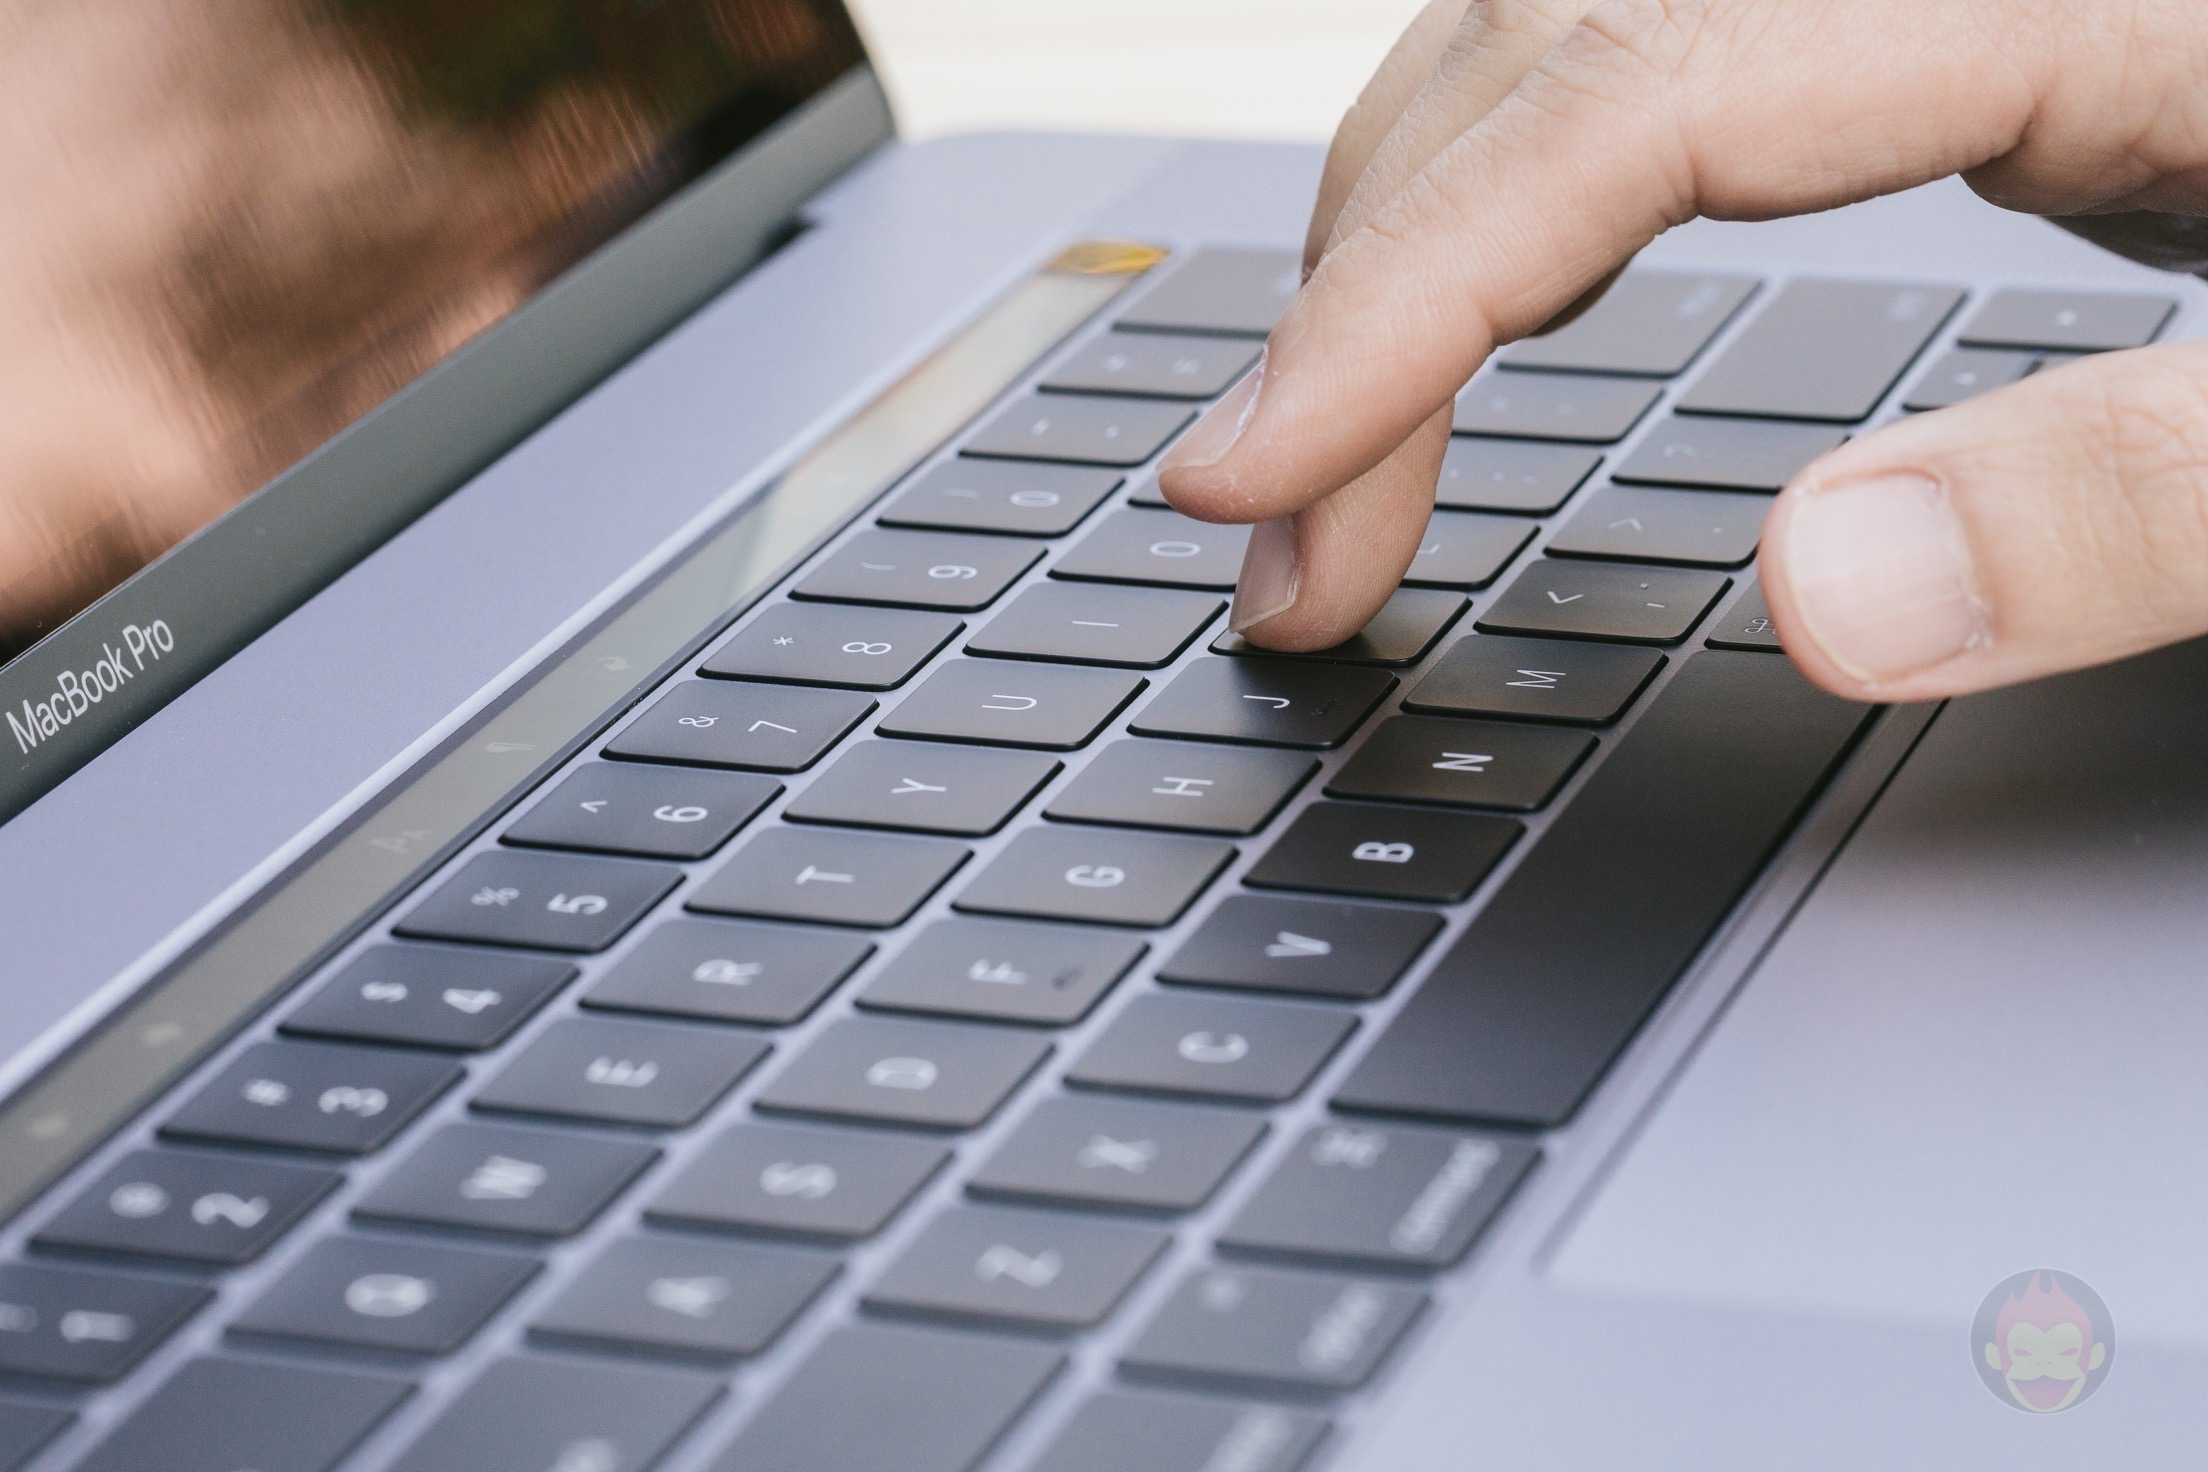 MacBook-Pro-Late2016-15inch-Model-Trackpad-09.jpg